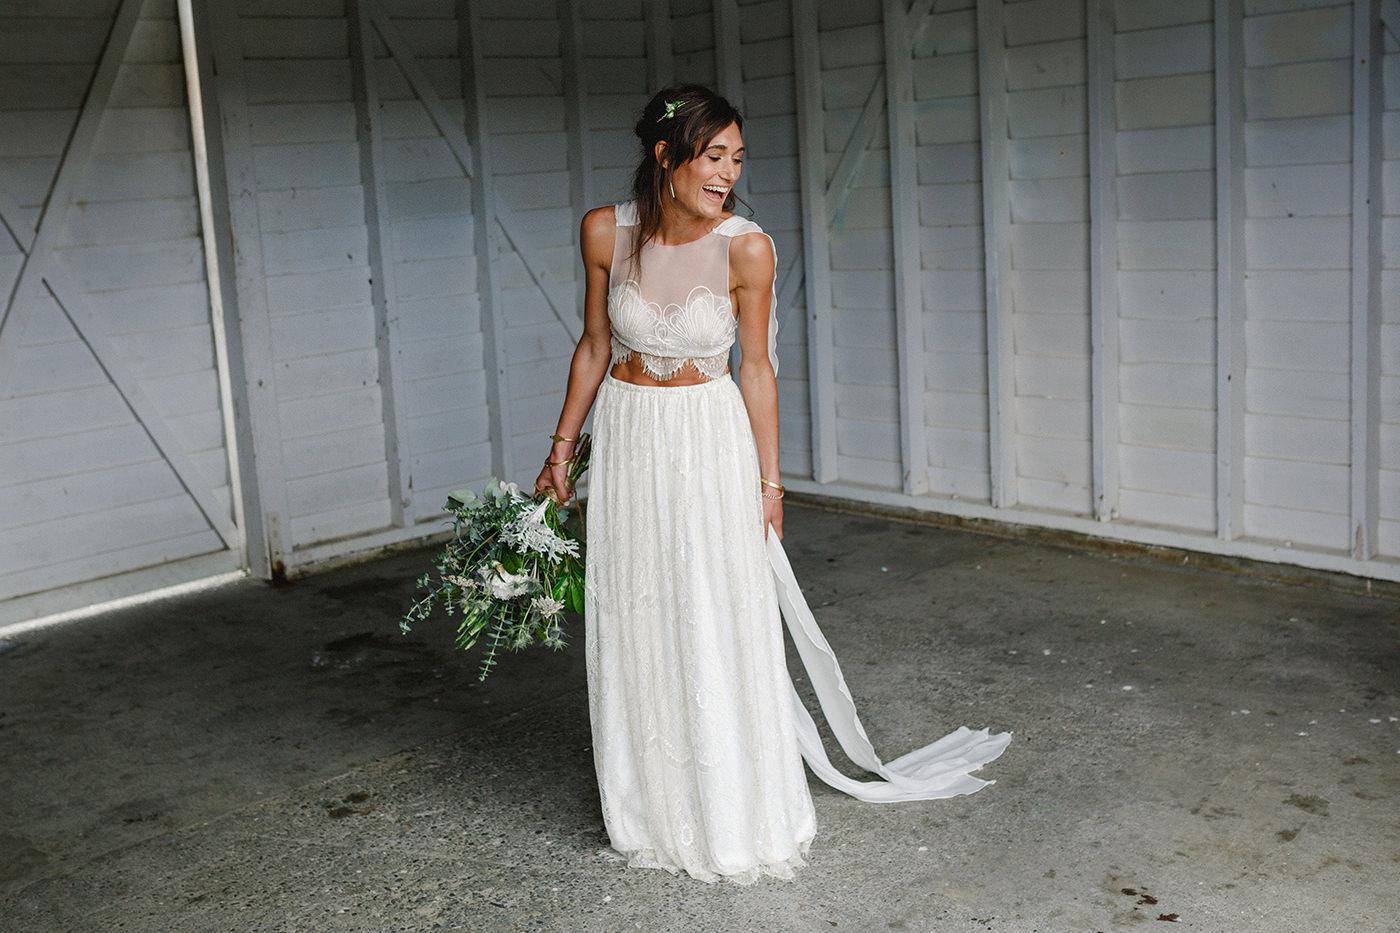 wedding_photographer_nz-00092.jpg